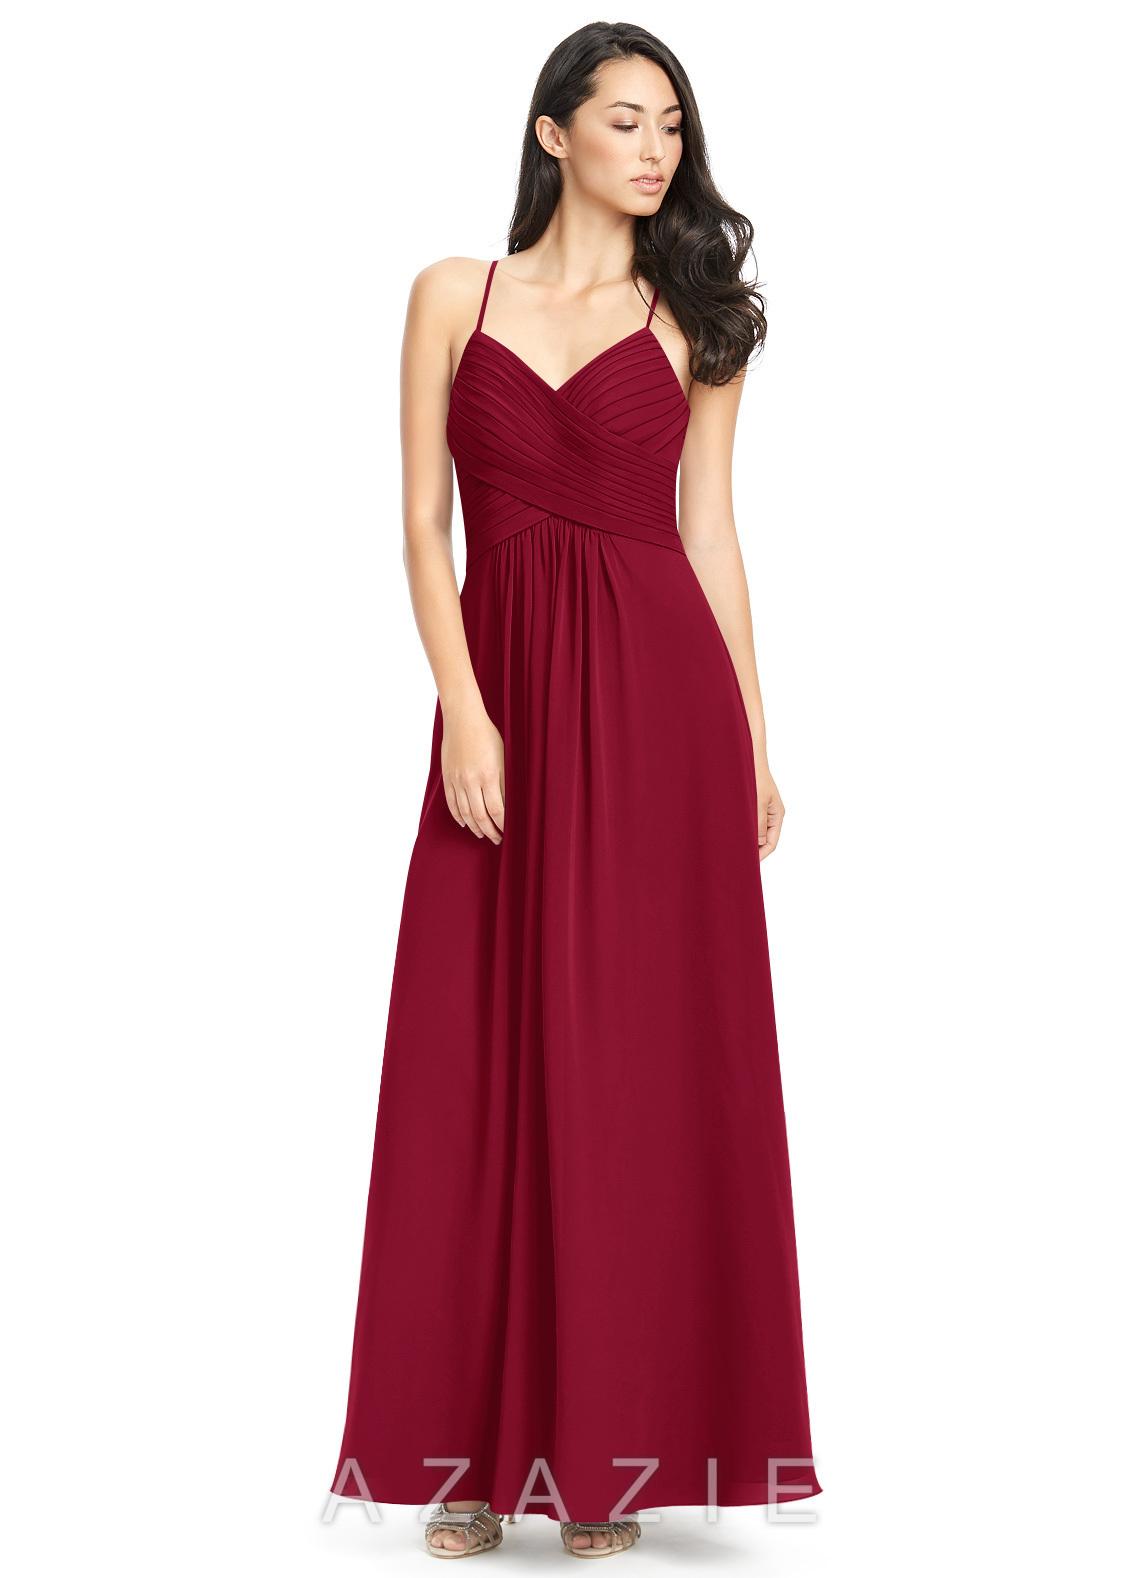 dfdad90b3bd Azazie Haleigh Bridesmaid Dress - Burgundy